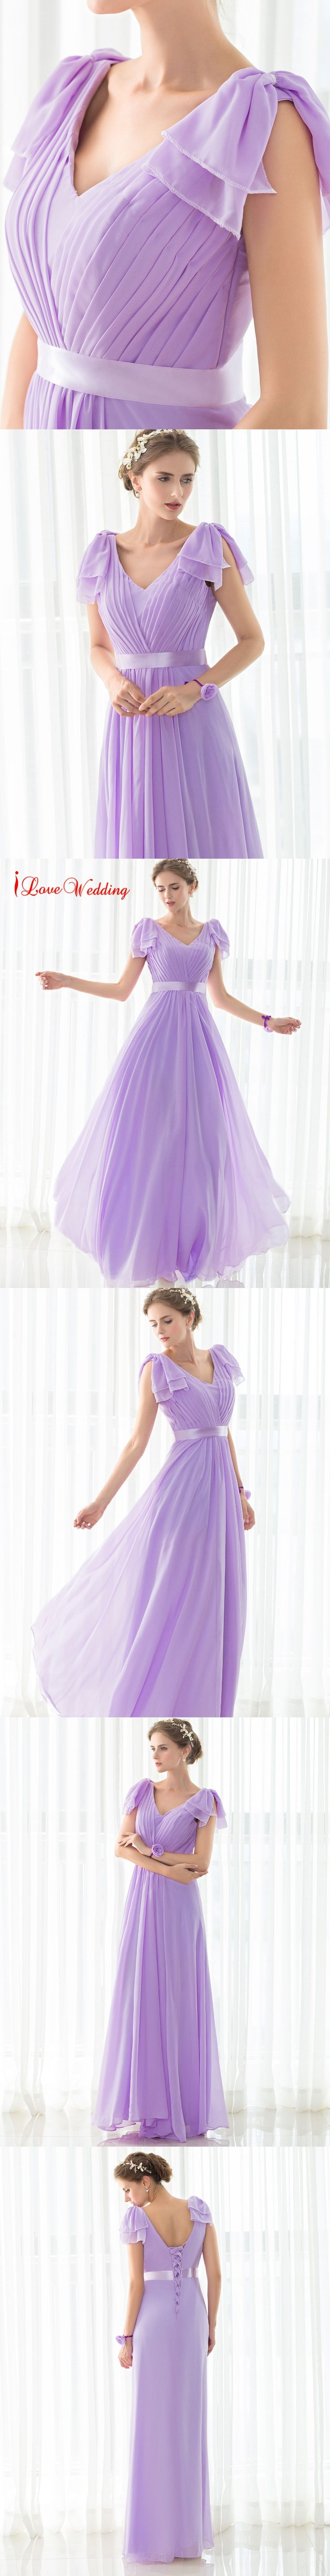 2017 Hot Sale Long Purple Bridesmaid Dresses Chiffon Pleat Sleeveless Deep V-neck Bandage Bridal Party Gowns Cheap Dresses